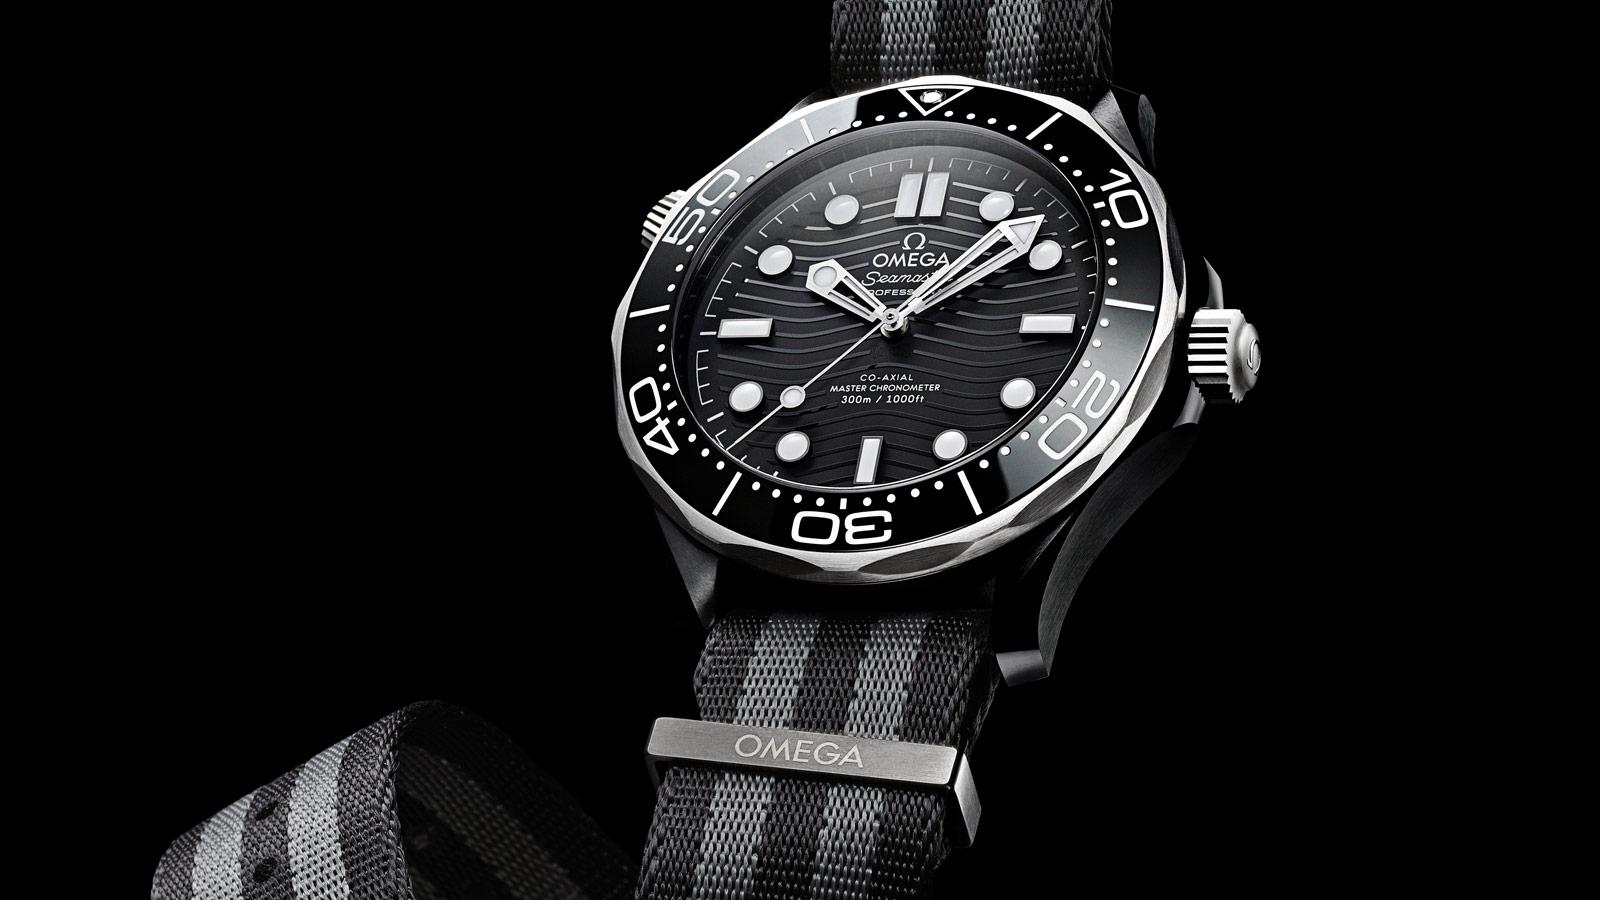 Seamaster 300米潜水表 300米潜水表 欧米茄至臻天文台表43.5毫米 腕表 - 210.92.44.20.01.002